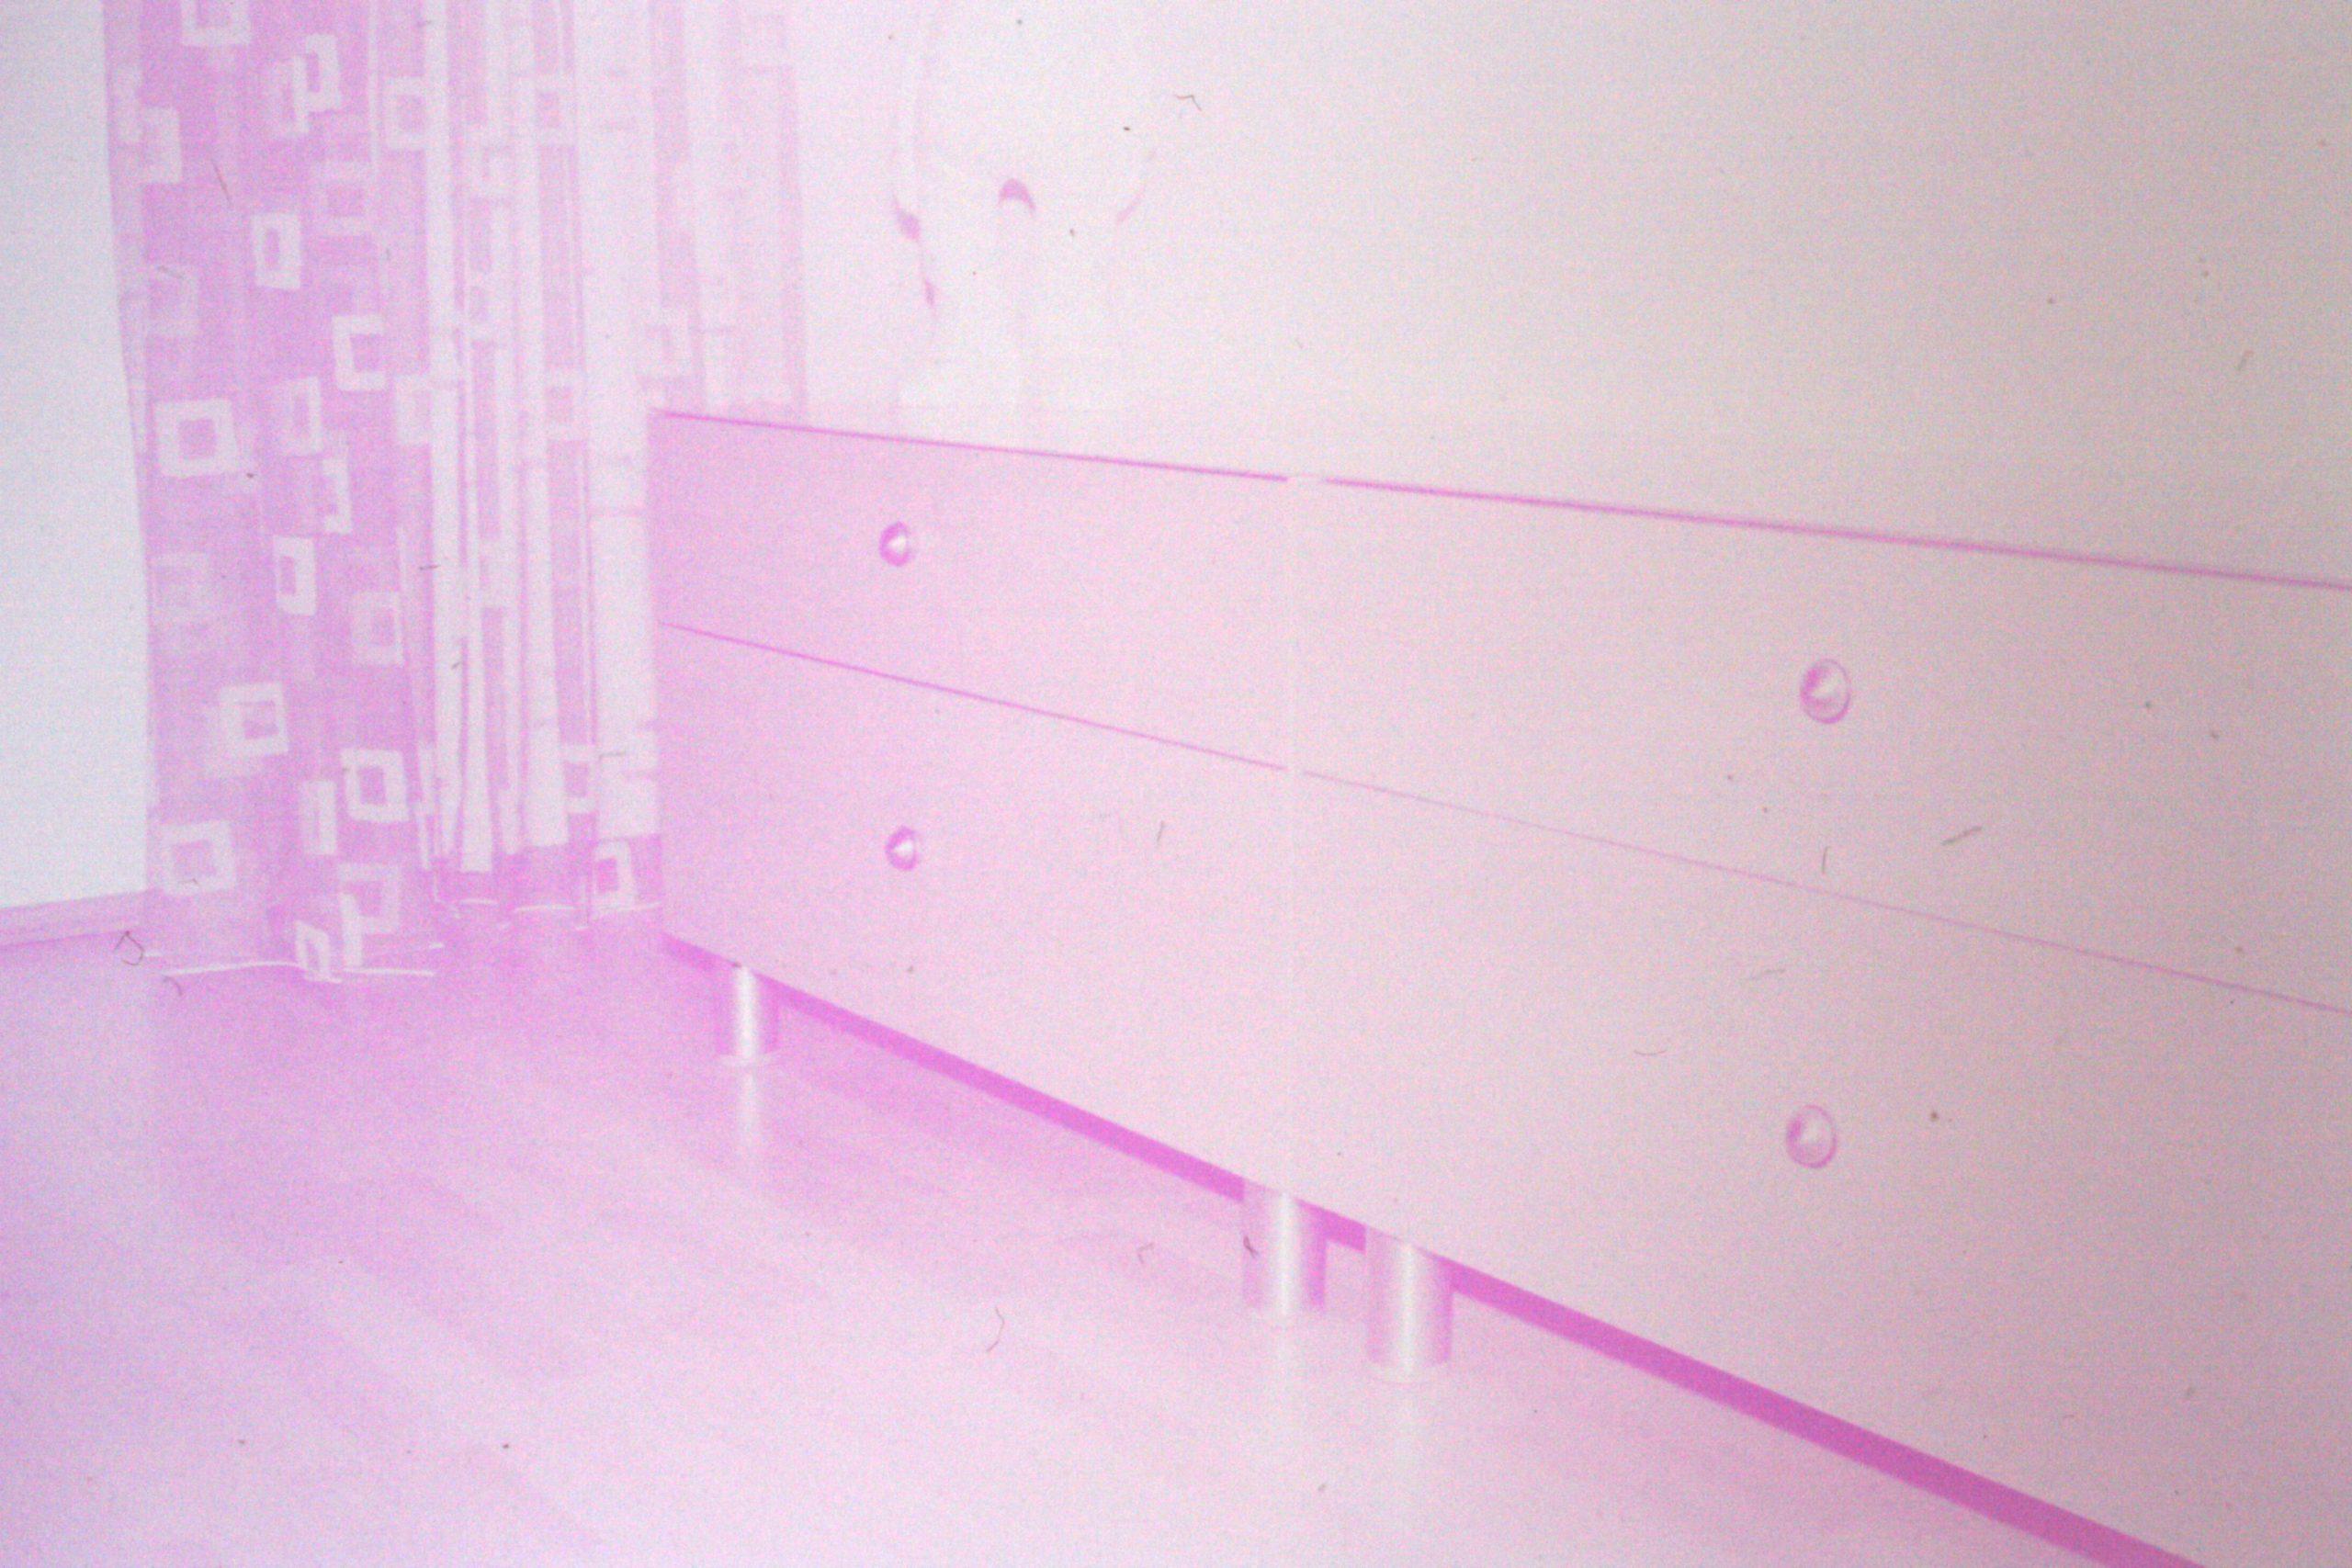 Möbelfoto auf altem Diafilm